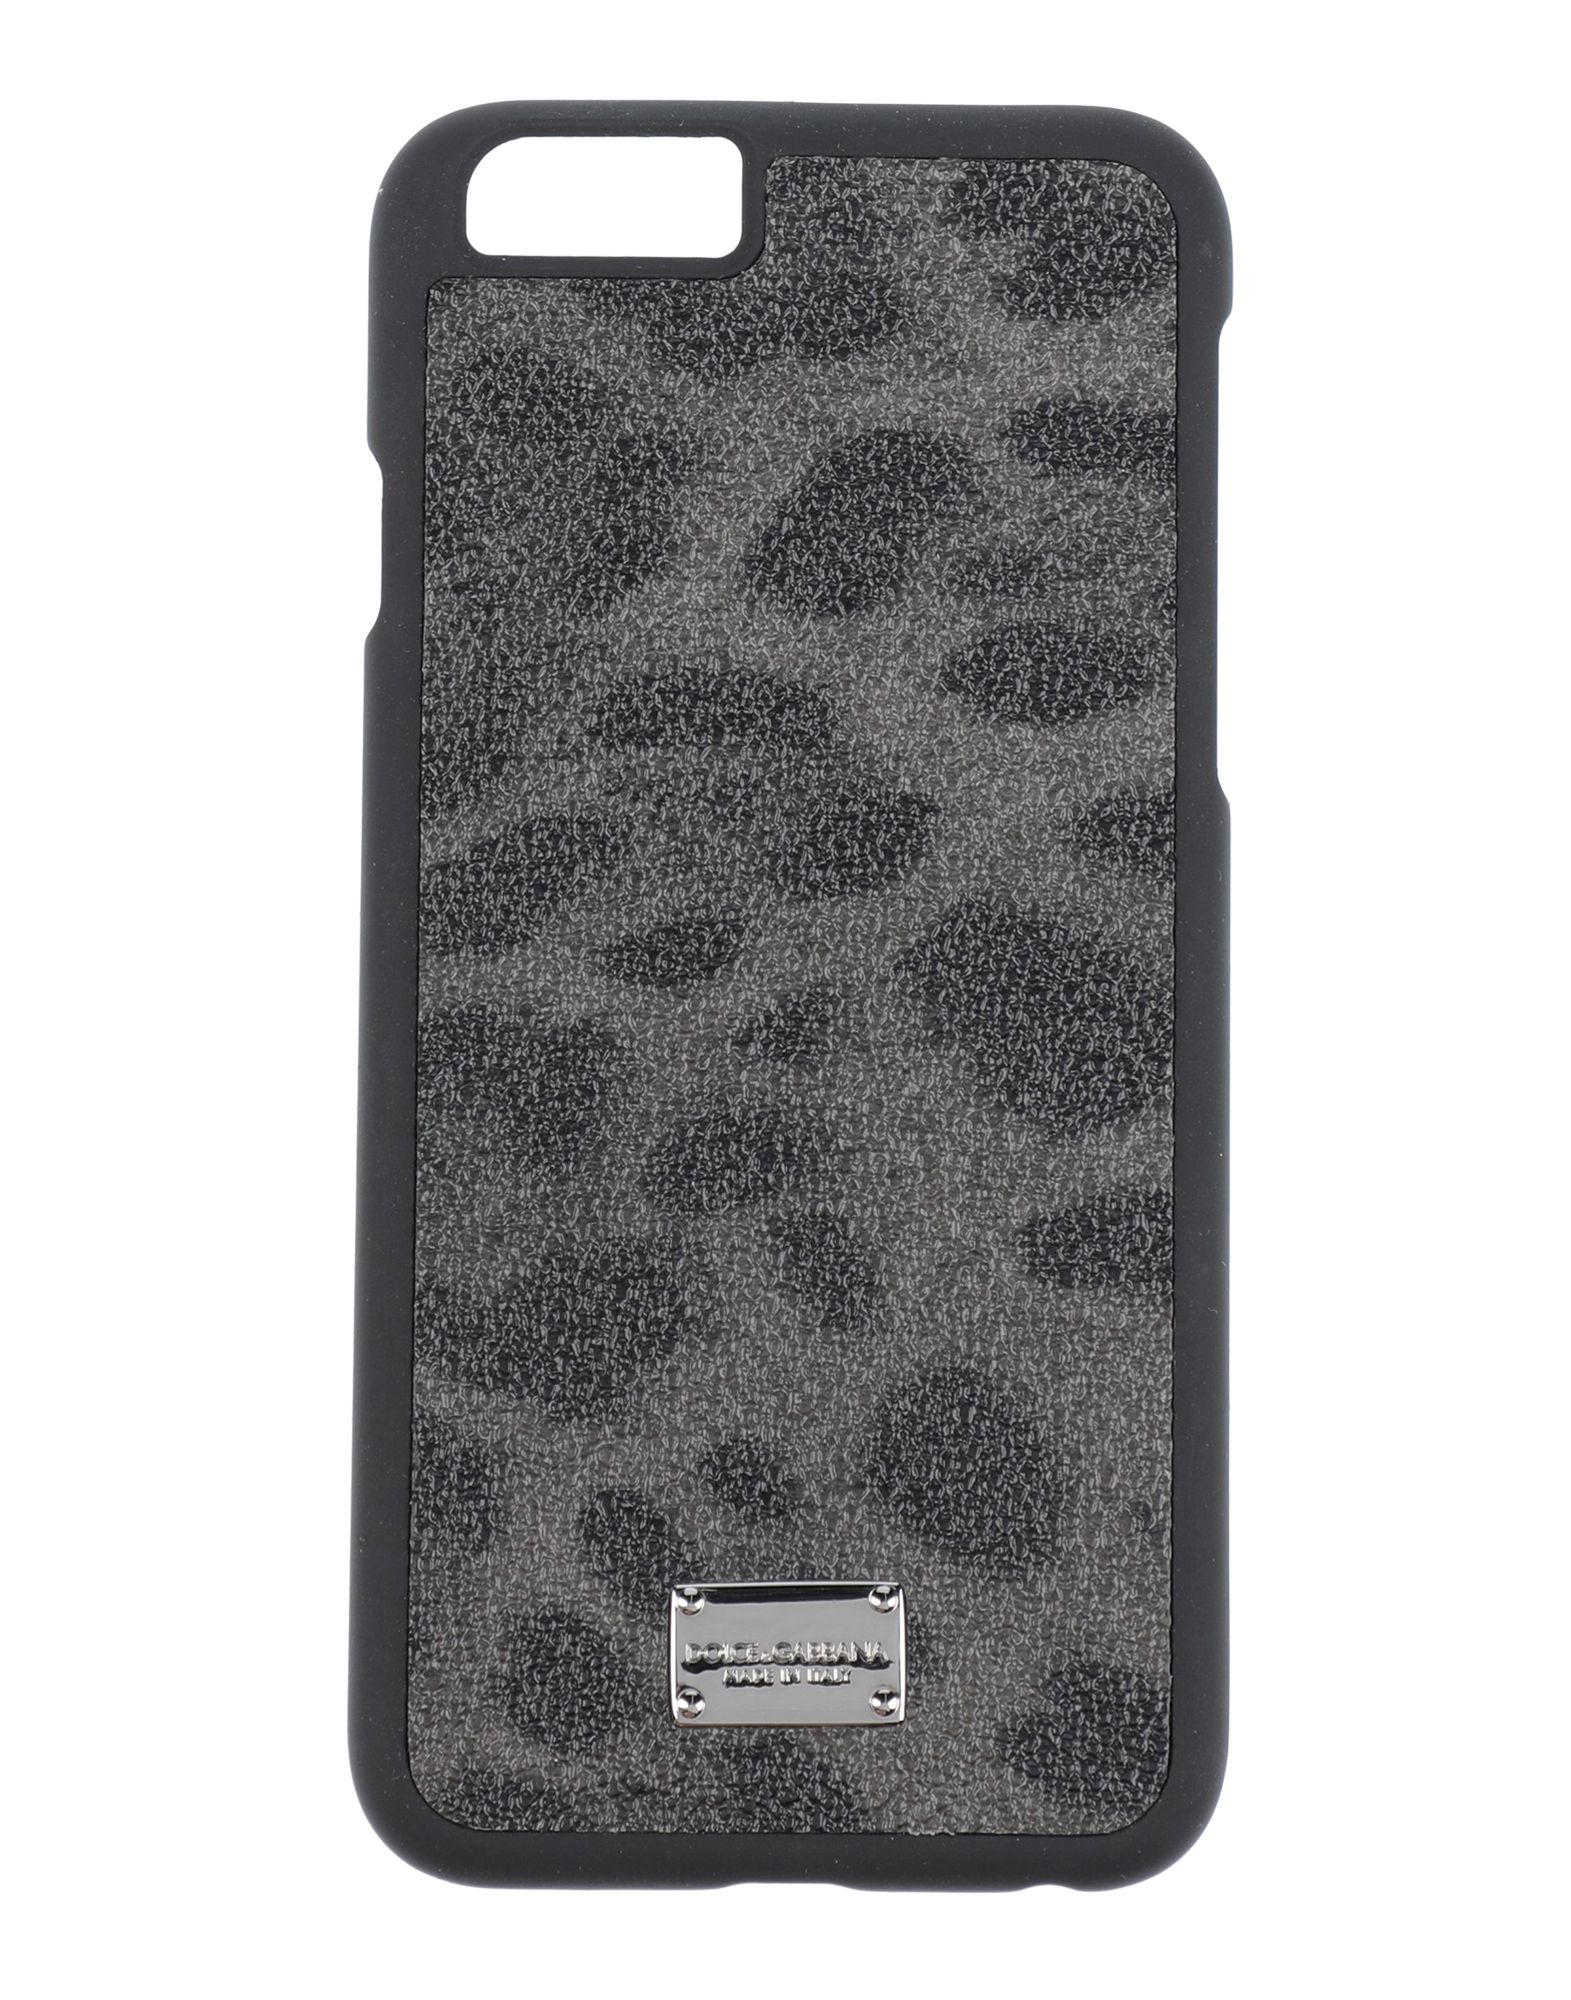 Фото - DOLCE & GABBANA Чехол чехол накладка для apple iphone 6 6s deppa gel plus case 85213 pink клип кейс полиуретан